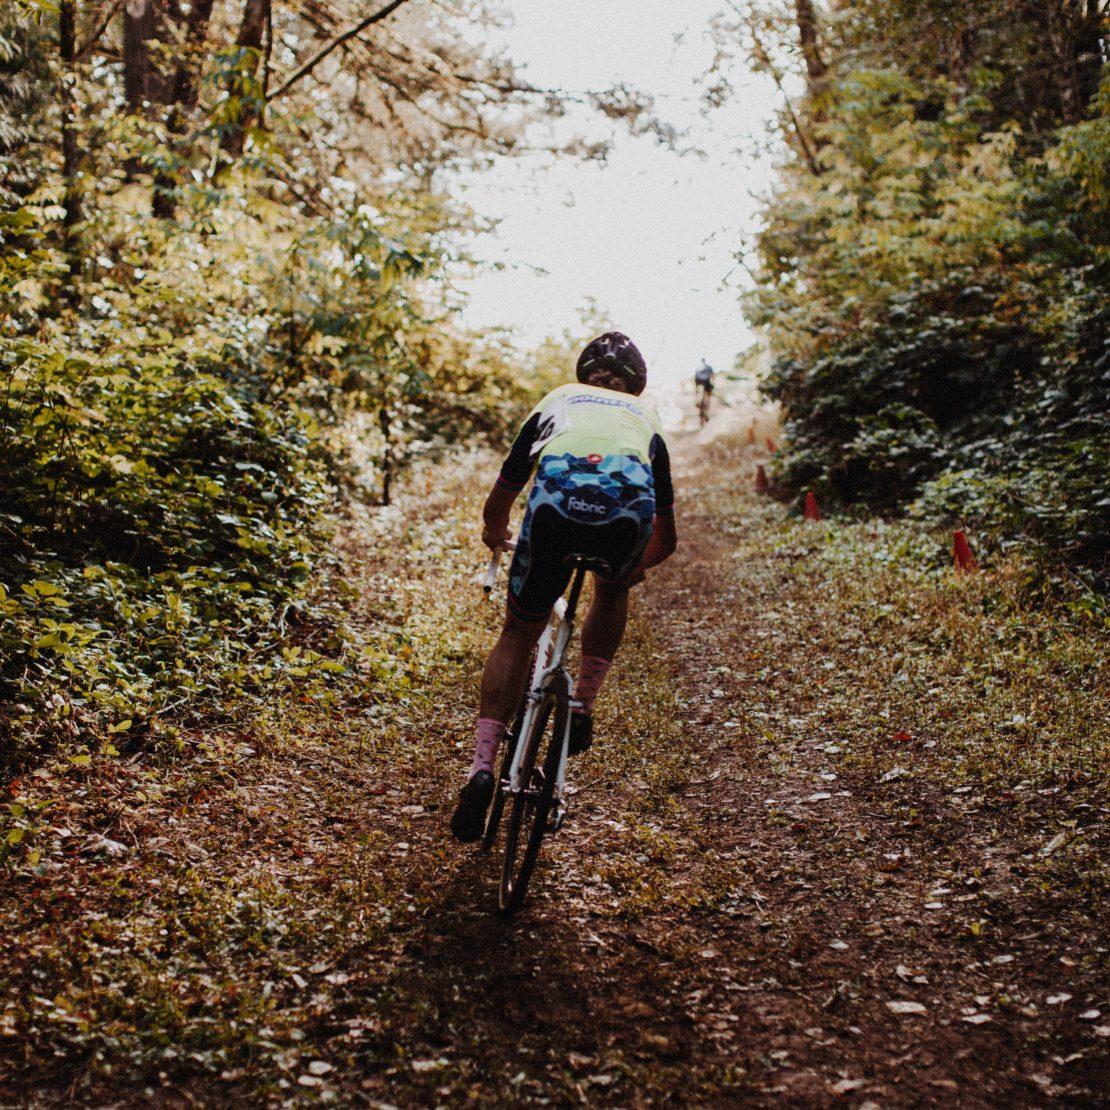 active-adventure-bicycle-1443527